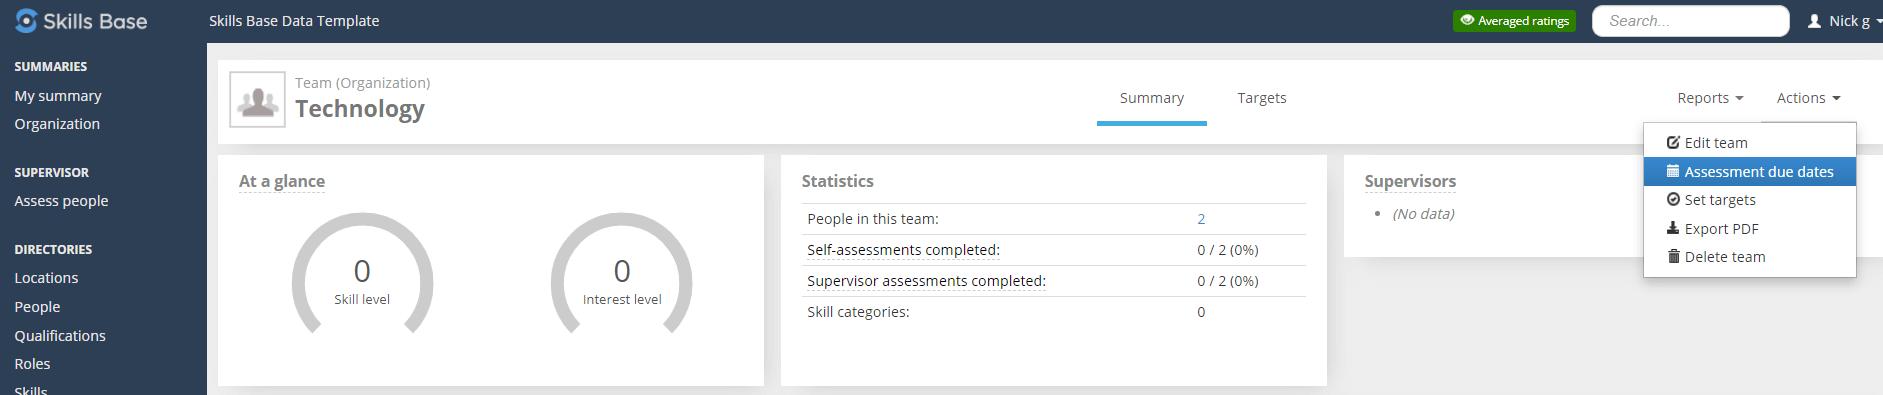 Skills Base Dashboard Assessment Due Date